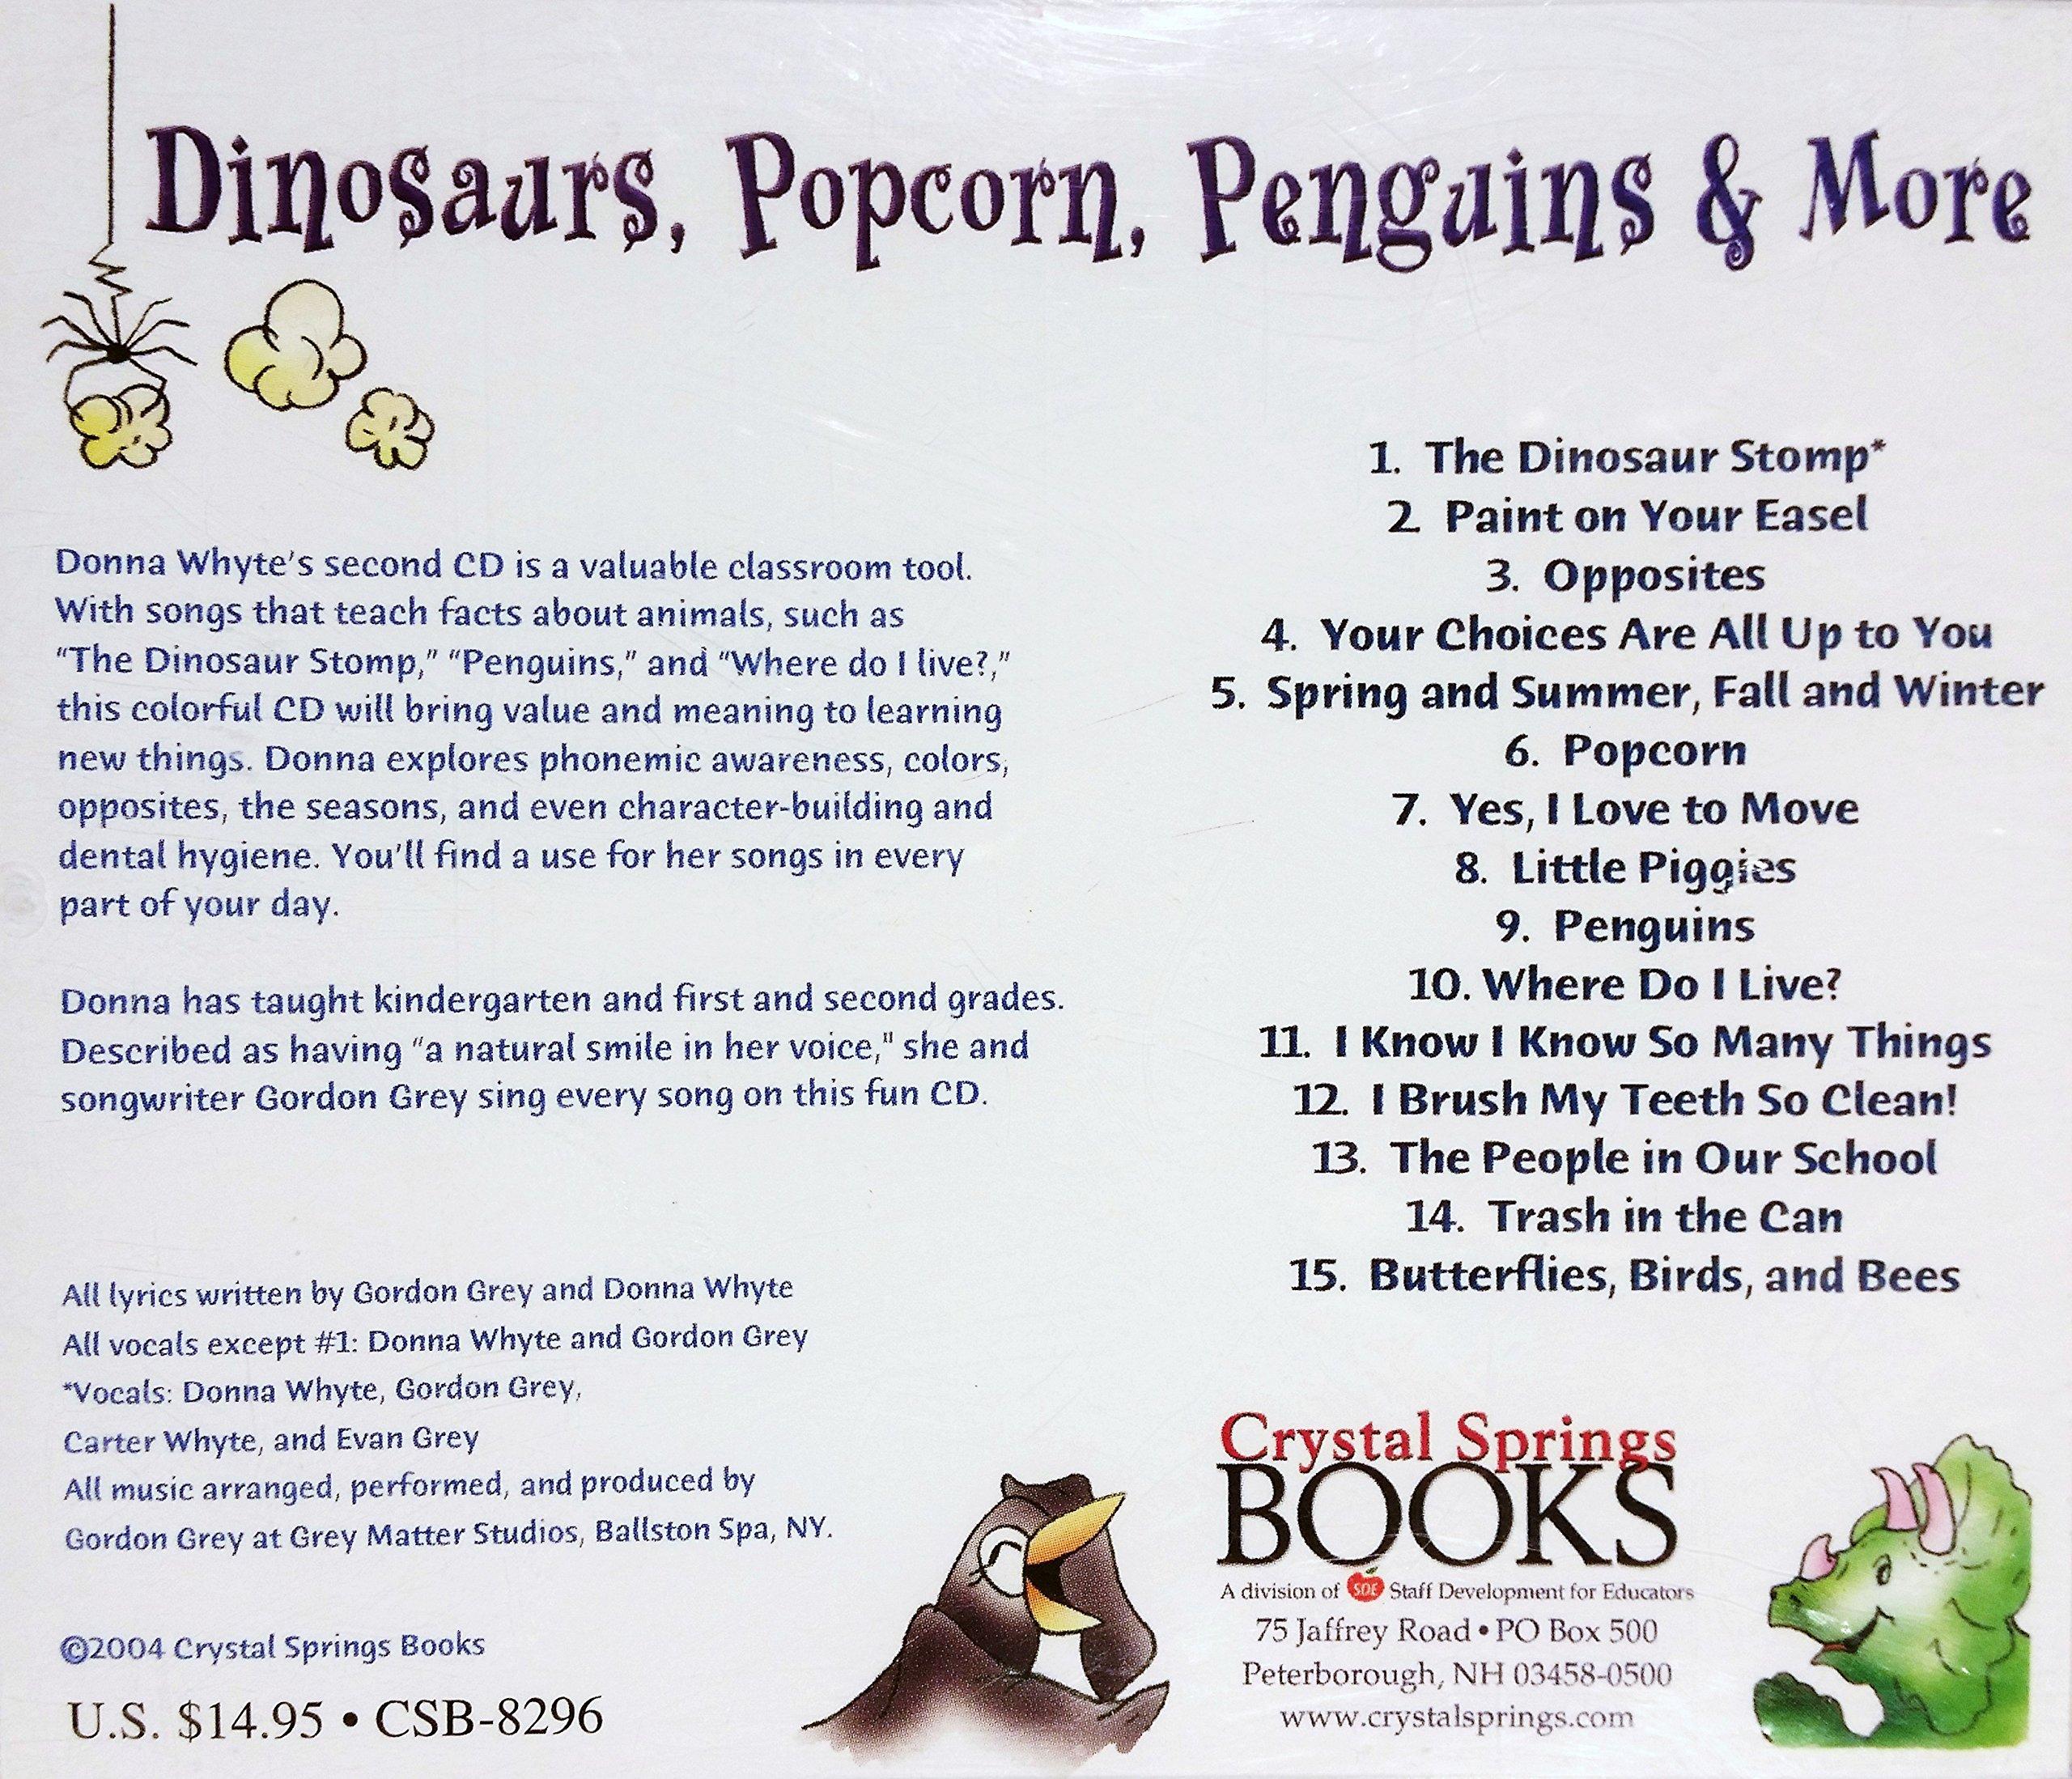 Dinosaurs, Popcorn, Penguins & More....: Donna Whyte: 9781884548680:  Amazon.com: Books